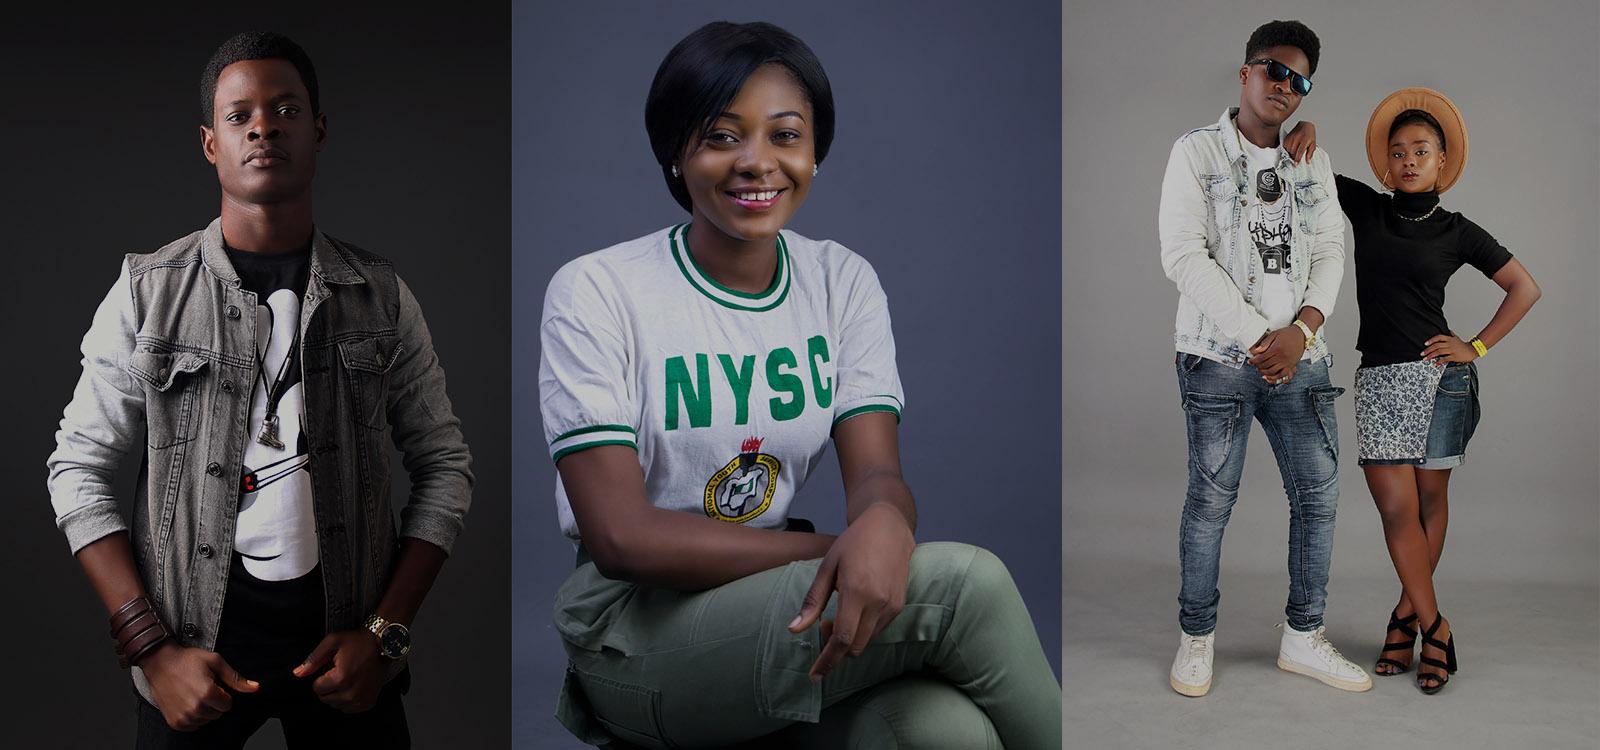 Elite Photo Studio Lagos